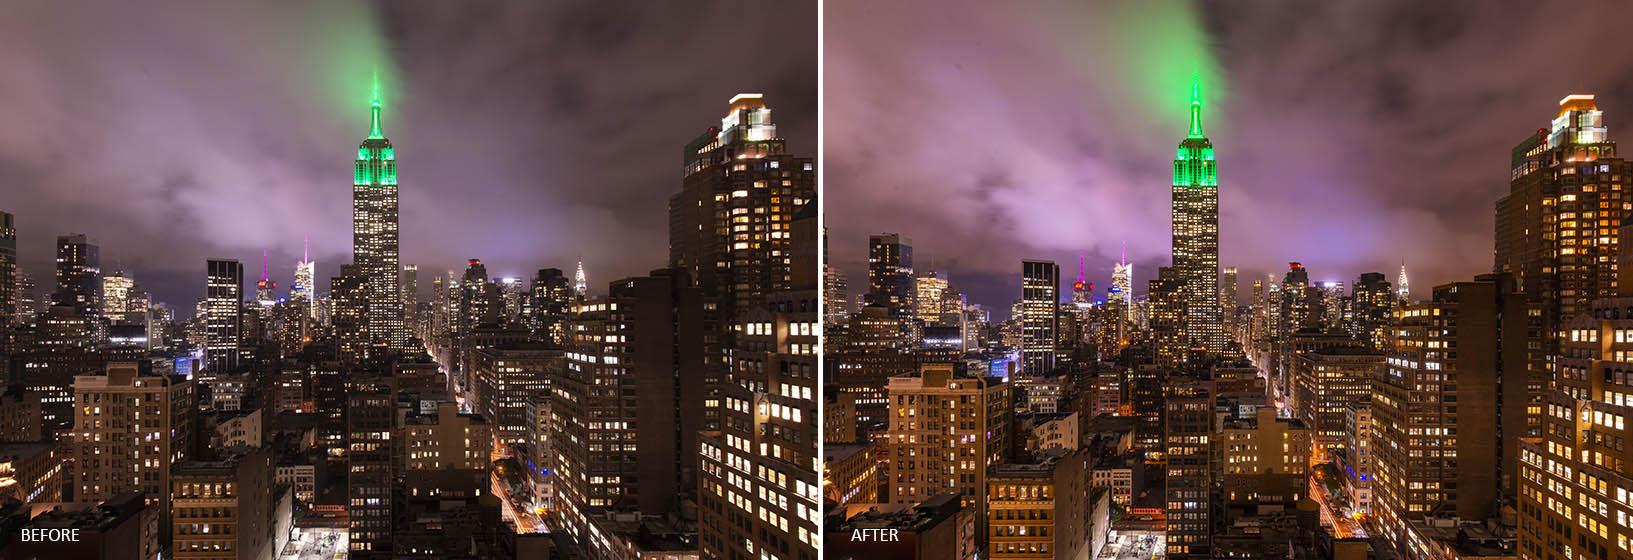 Adobe-Lightroom-preset-World-0003